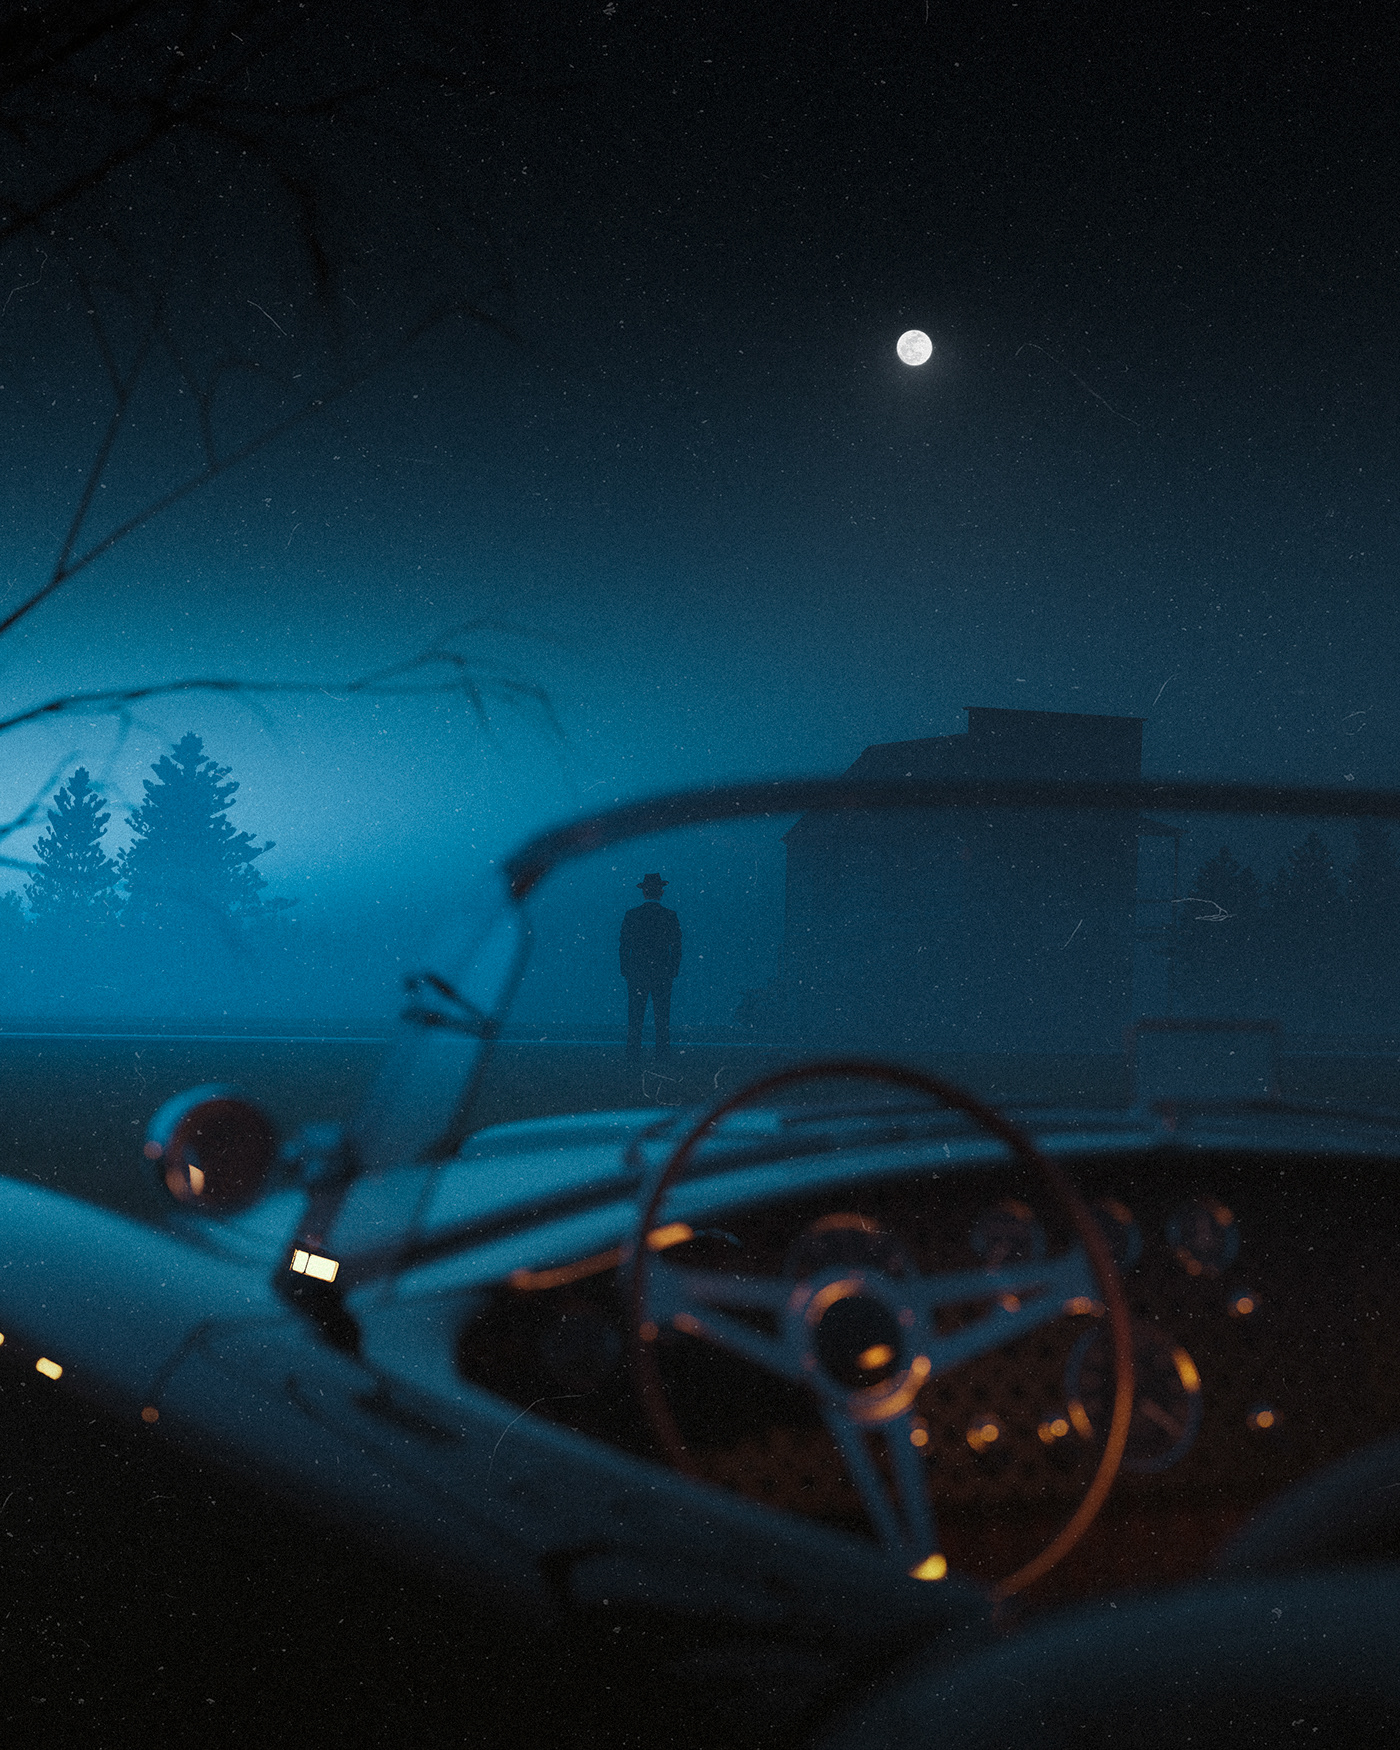 3D automotive   car Cinema concept dark Digital Art  horror movie night